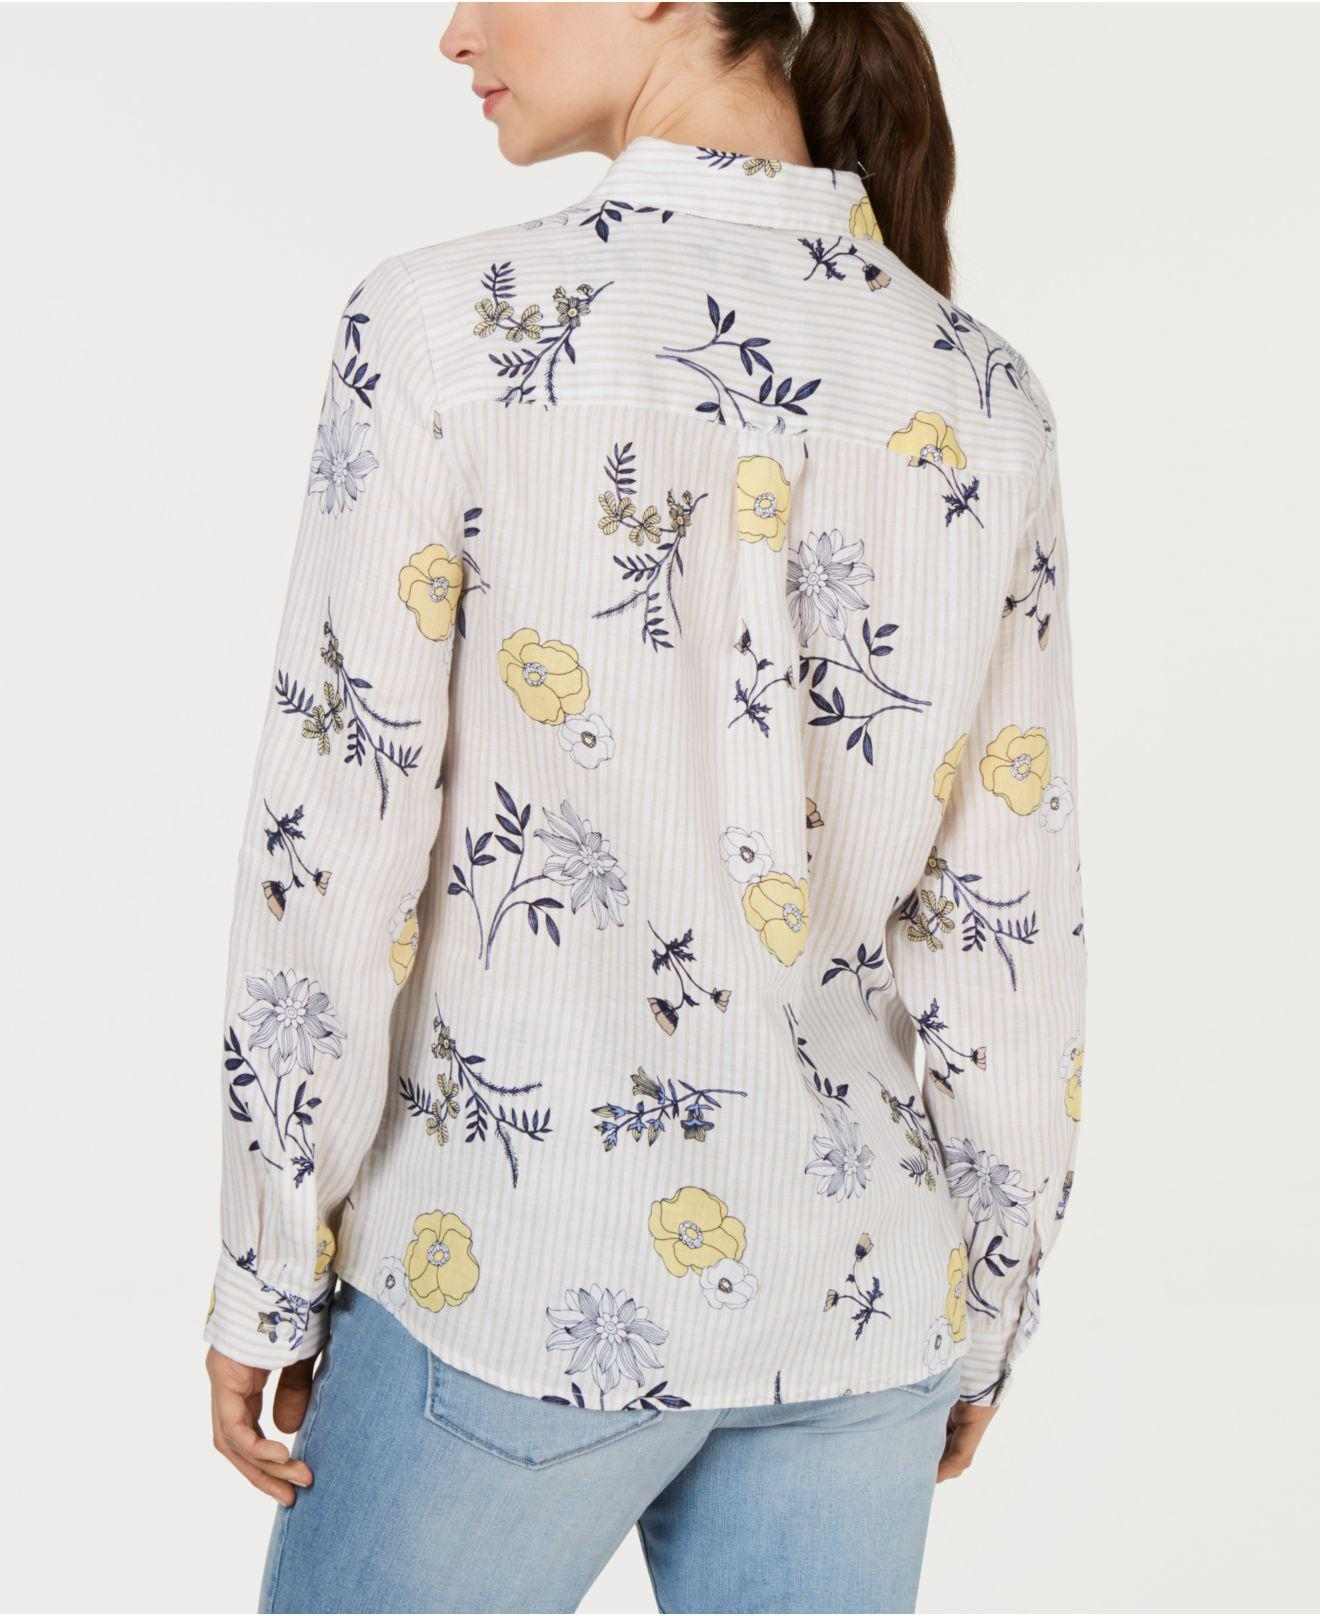 66050ec887e Lyst - Charter Club Linen Floral-print Utility Shirt